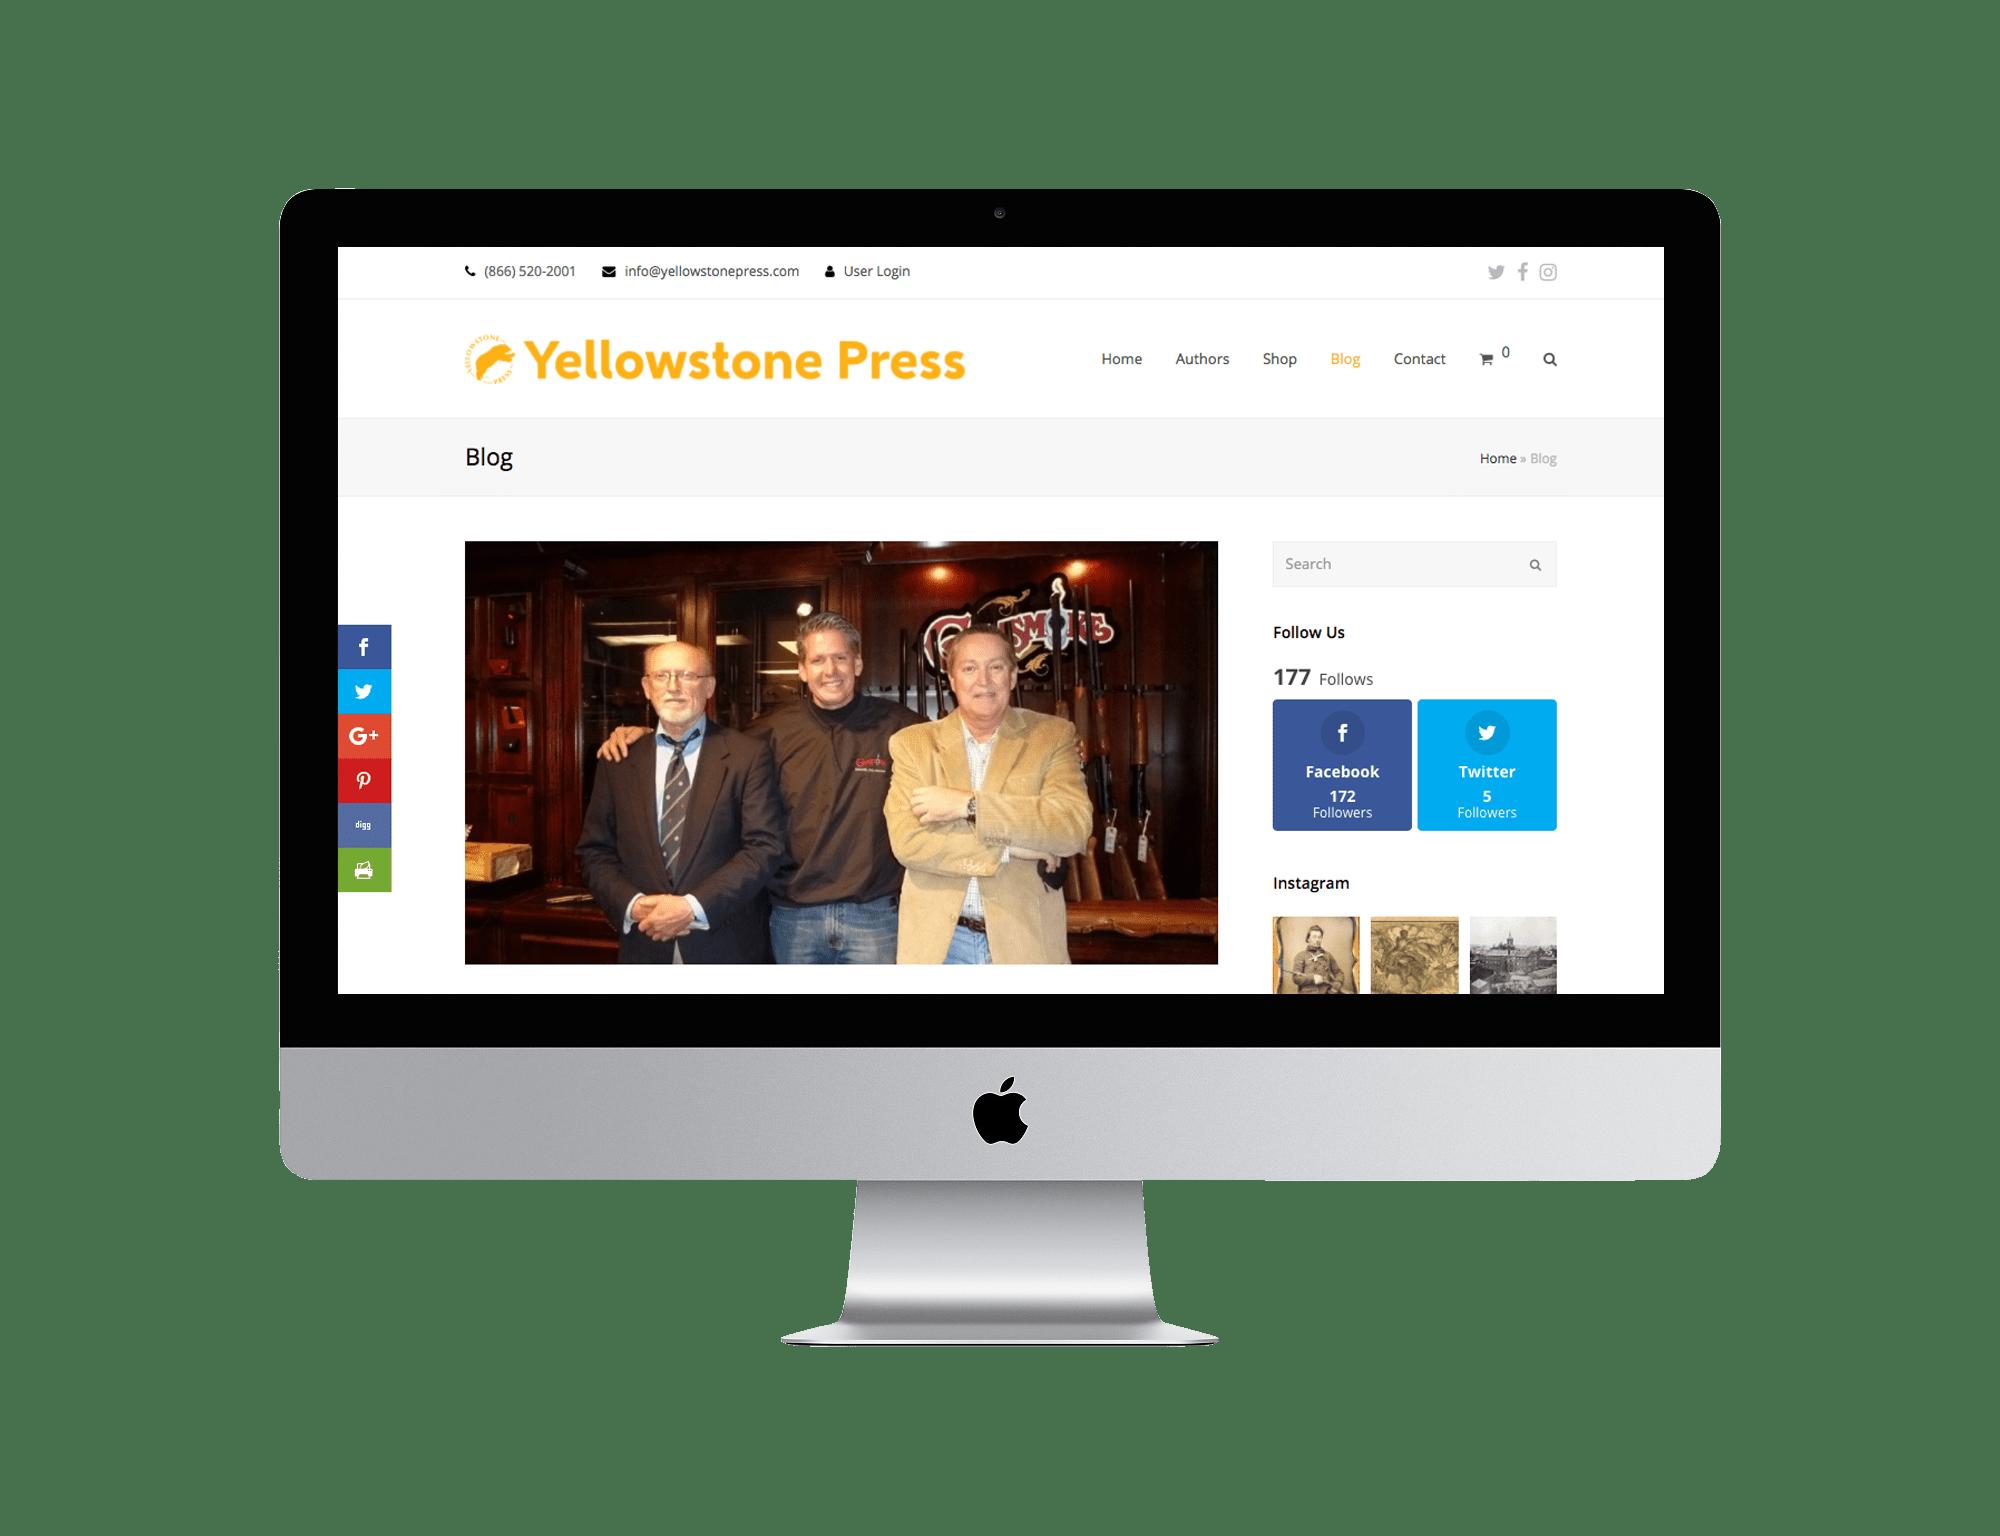 YellowstonePress.com Blog